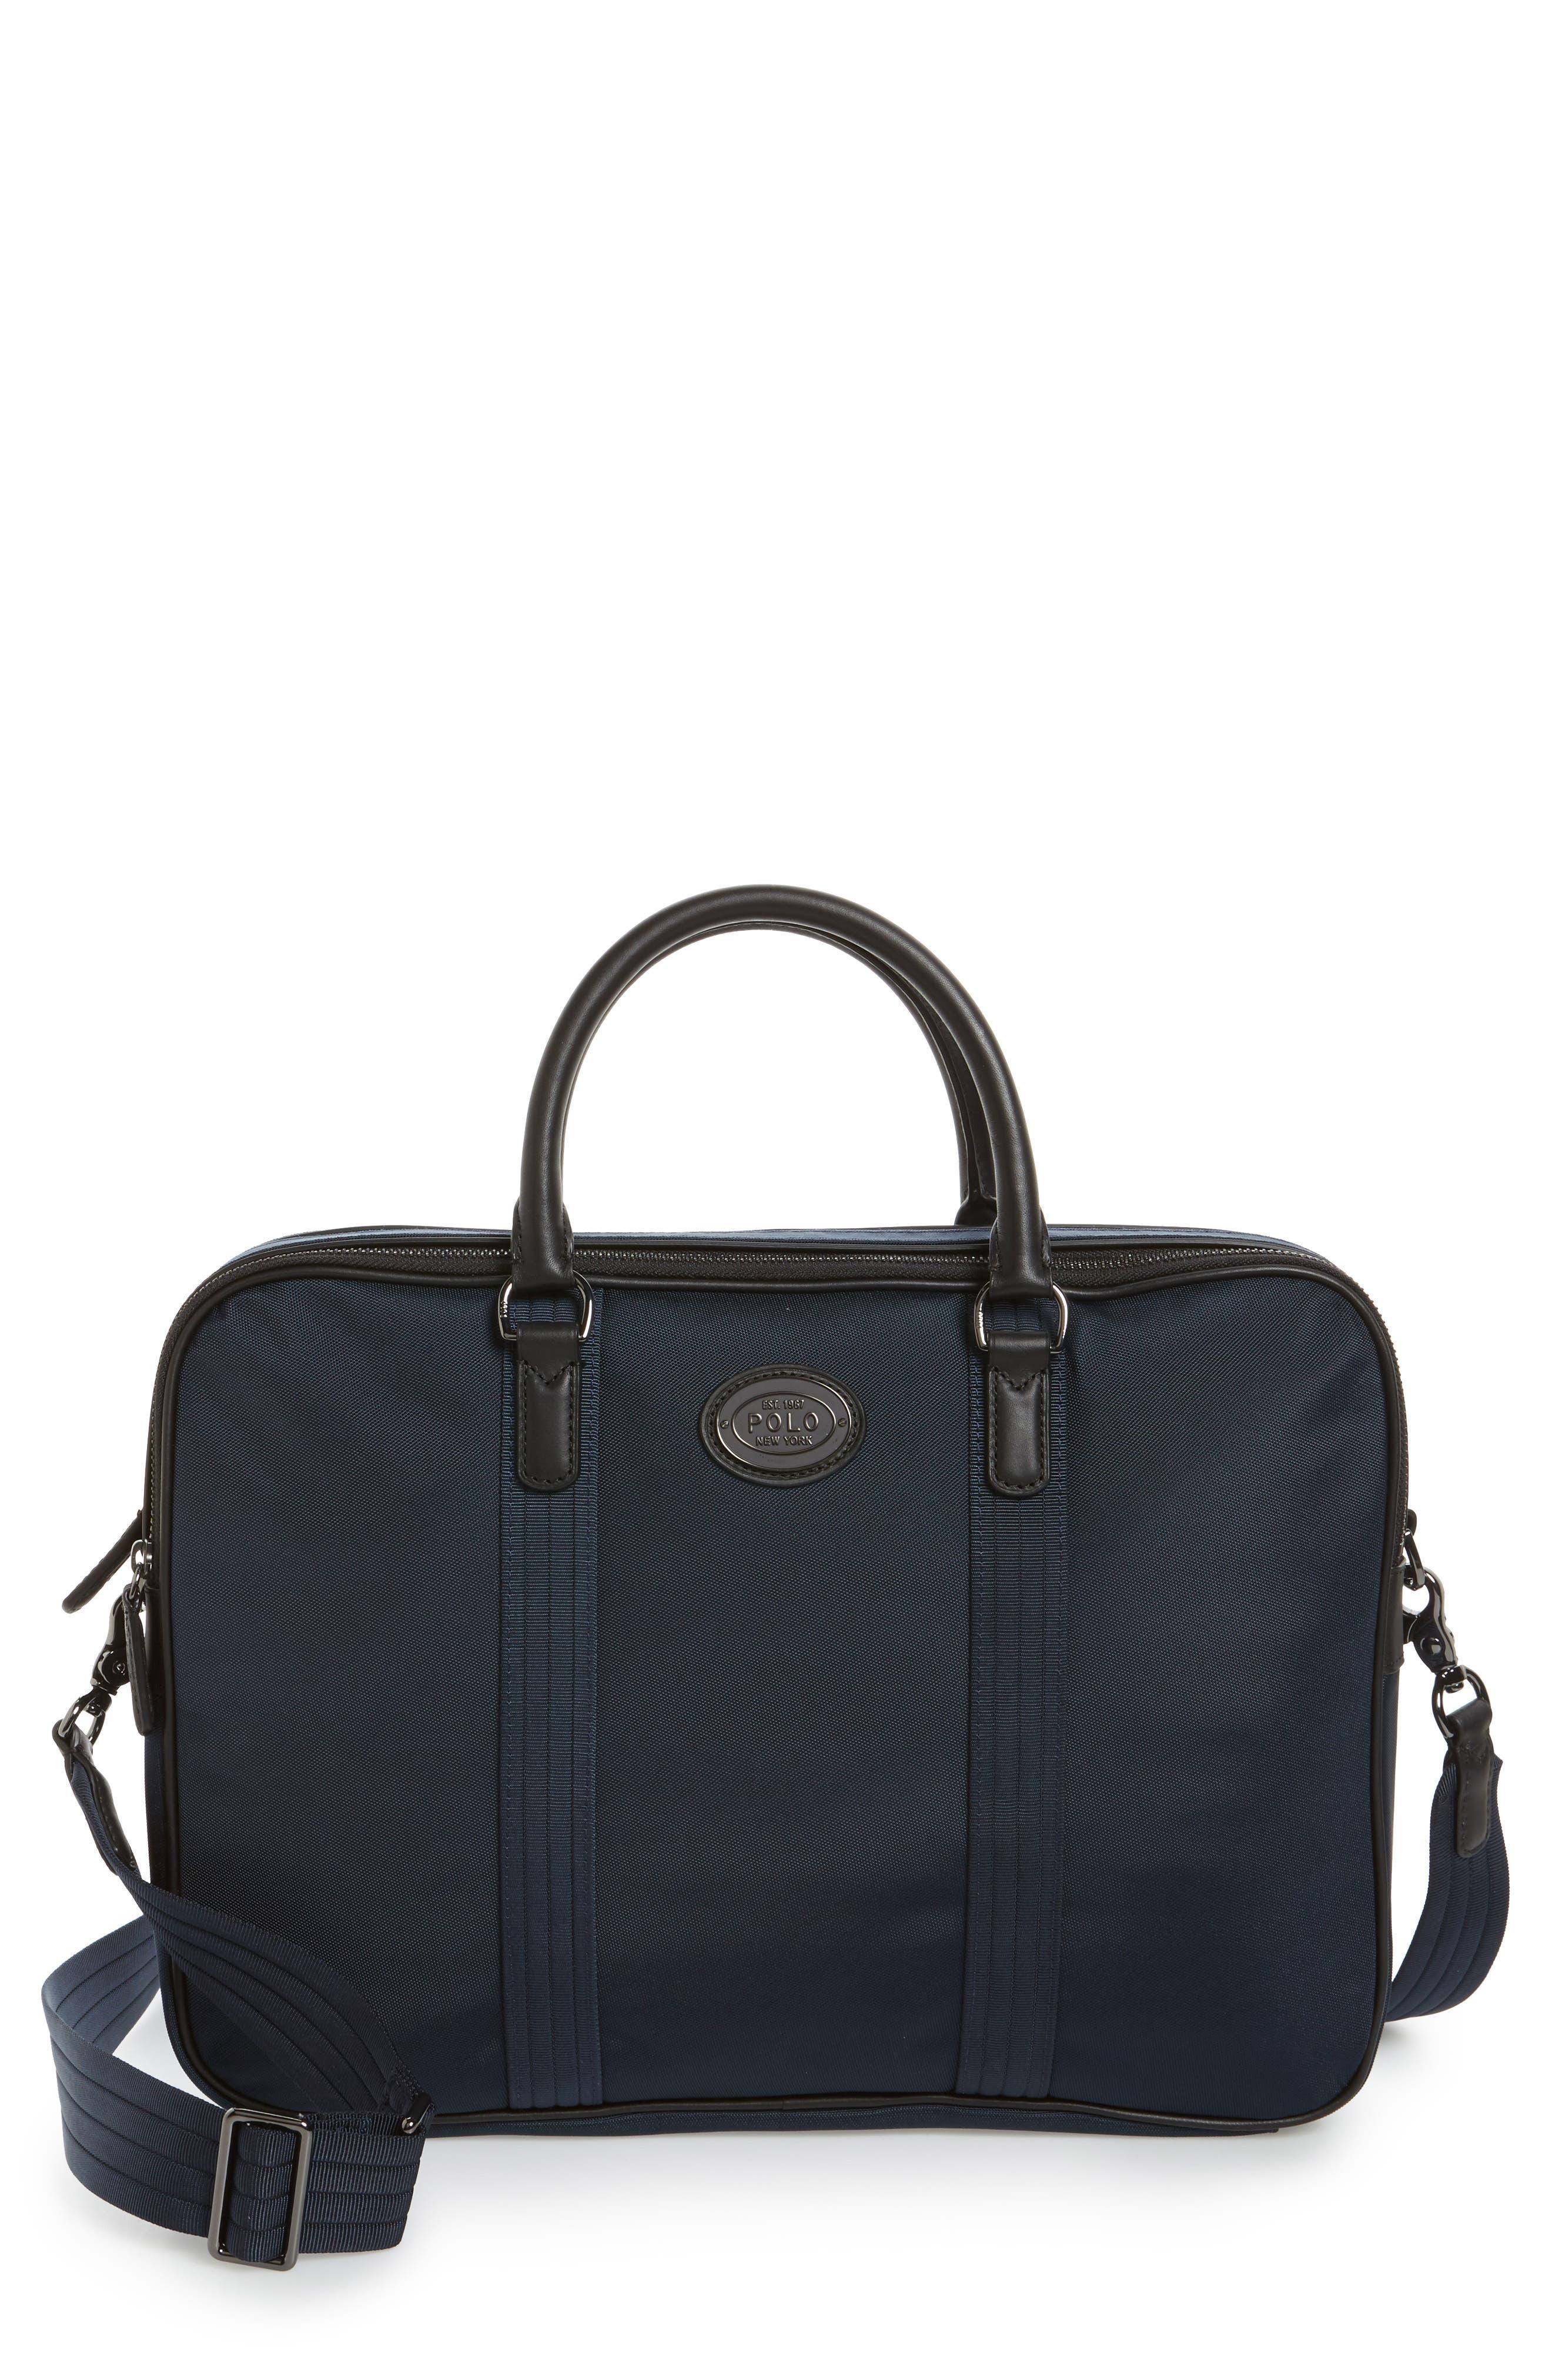 Polo Ralph Lauren Commuter Briefcase